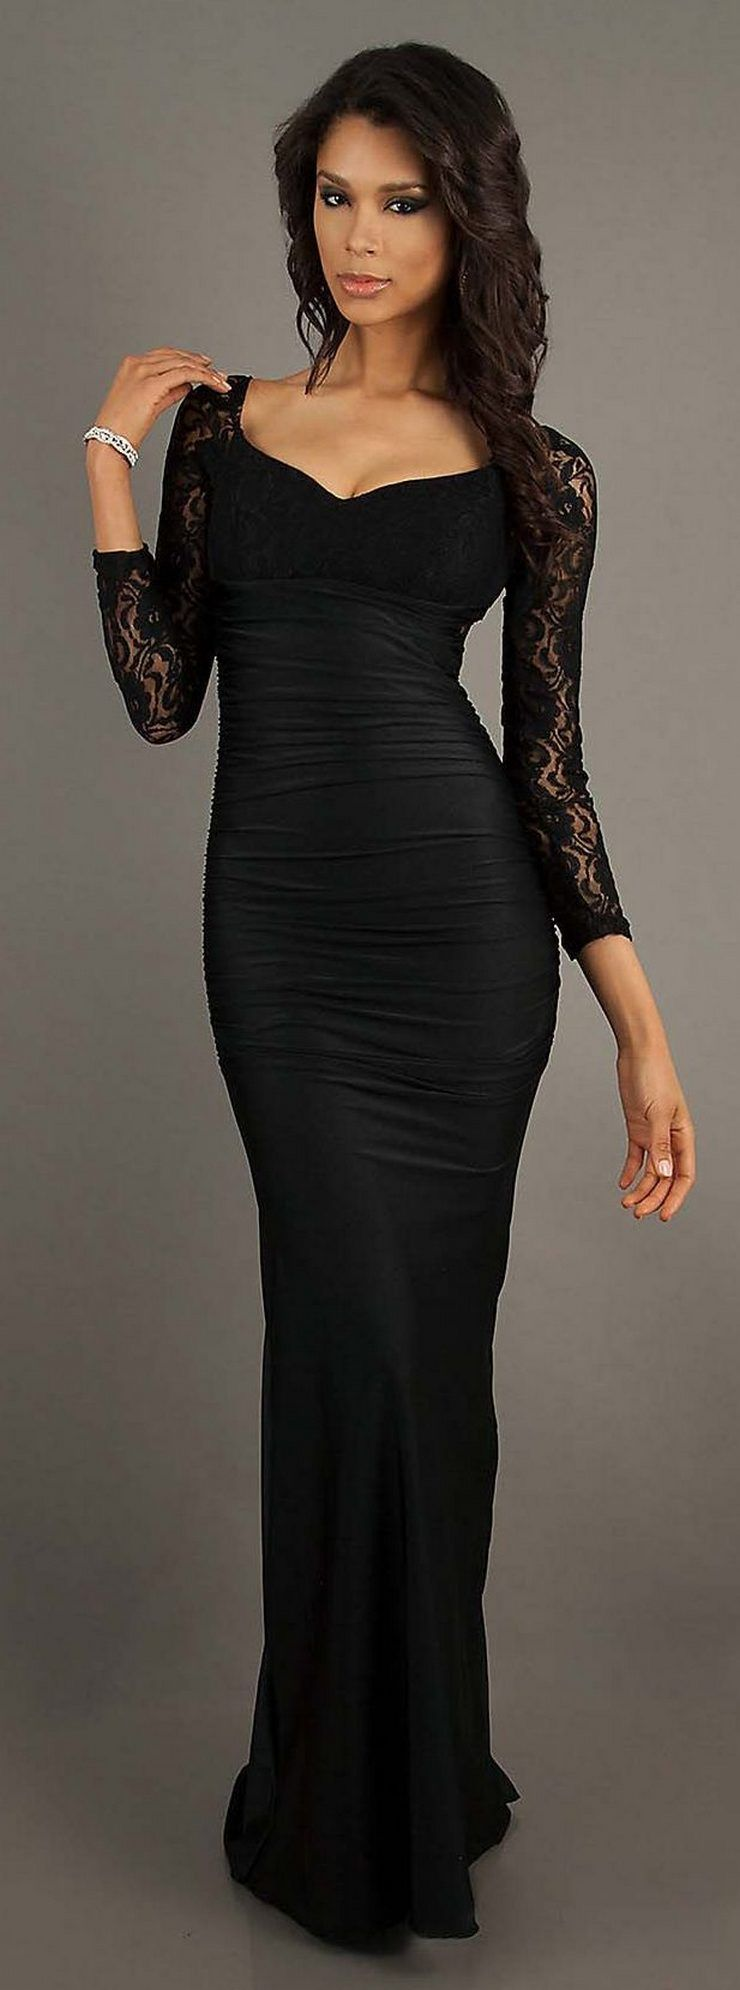 Trends black long sleeve wedding dresses ideas wedding dresses